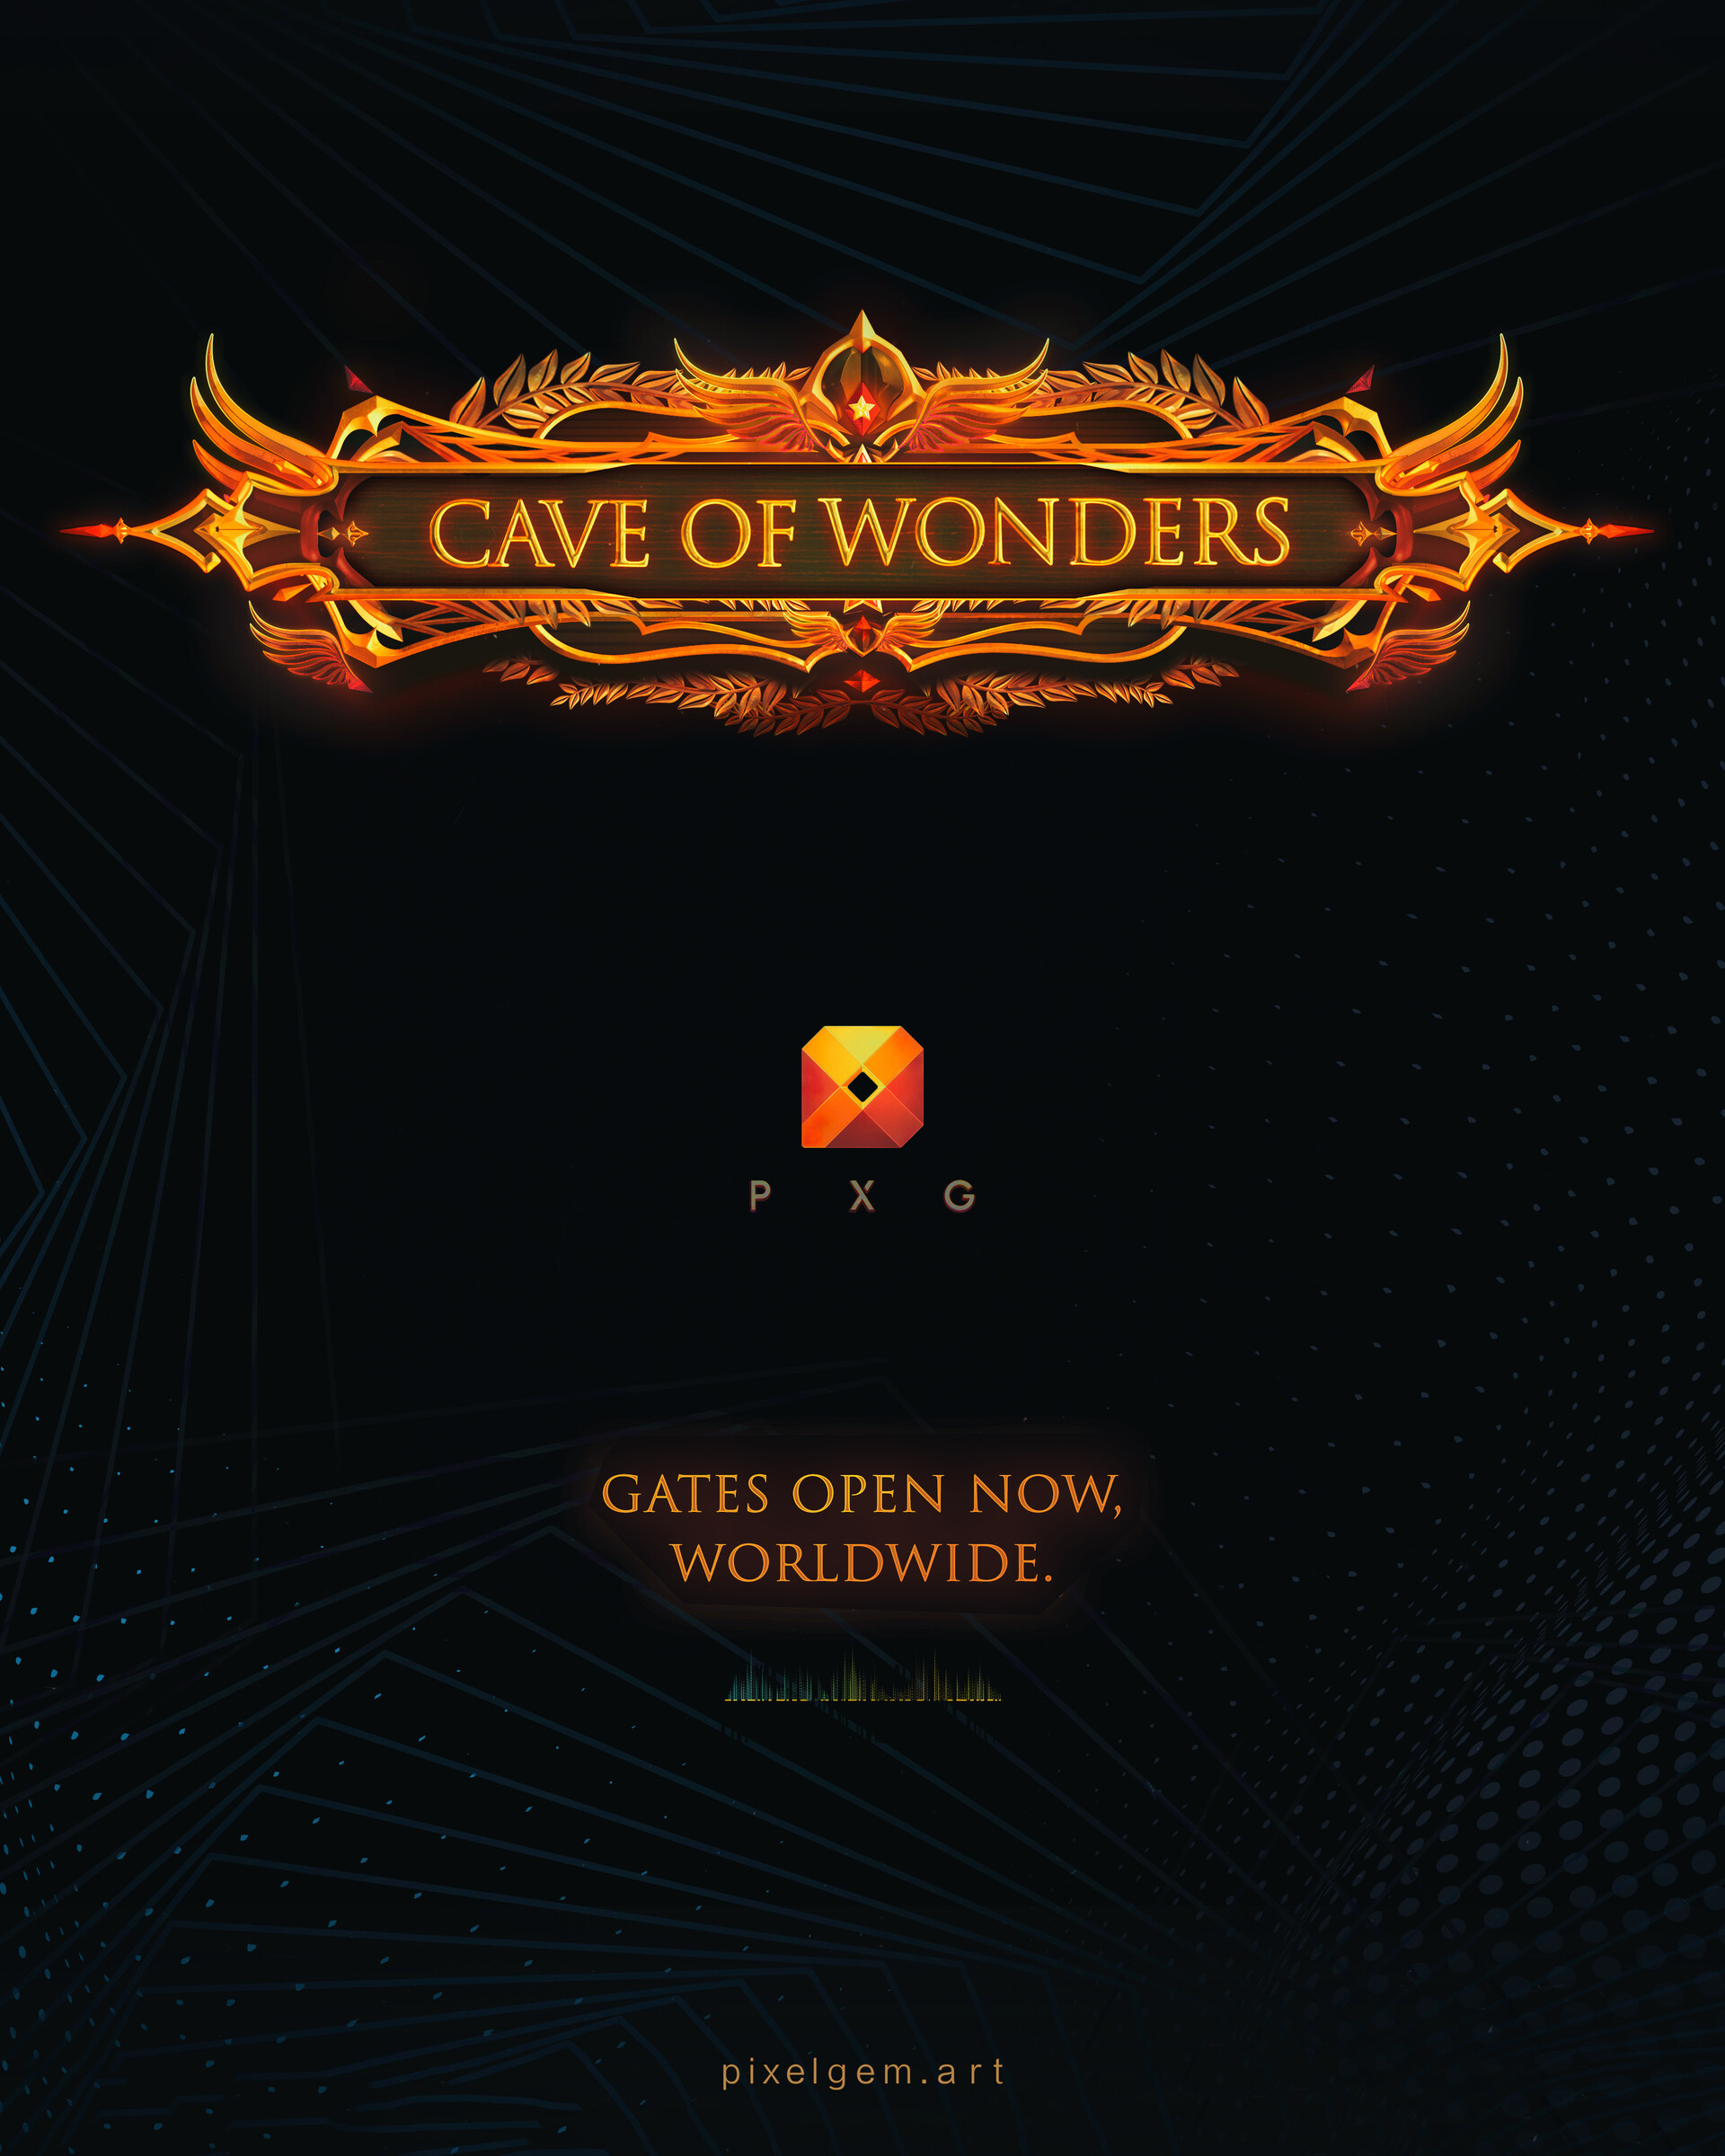 Long ken caveofwonders opennow 02